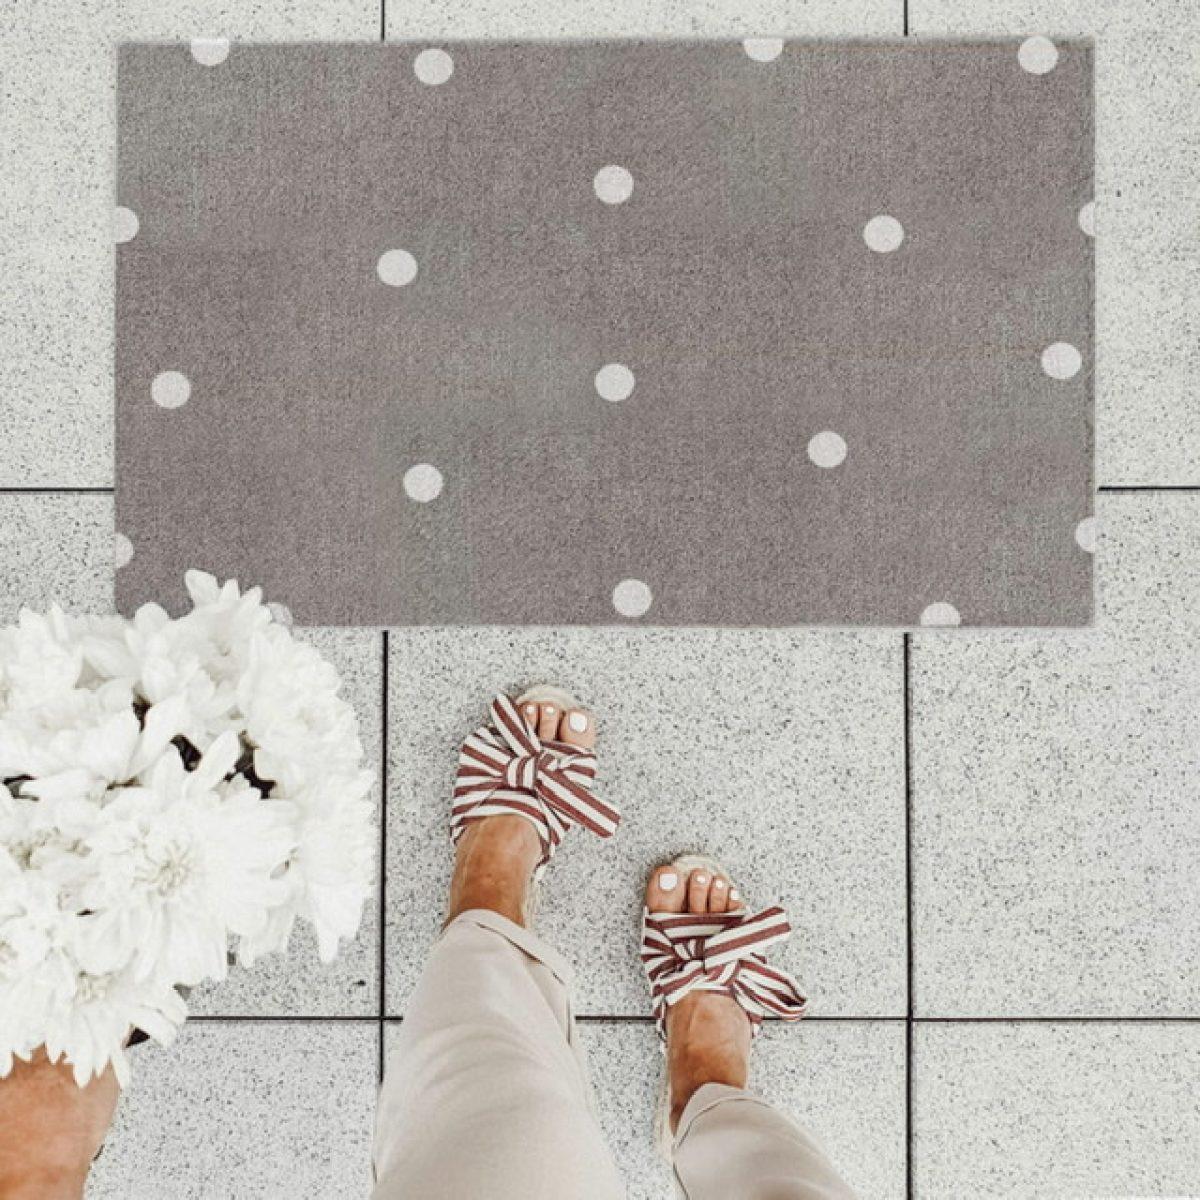 Fußmatte groß 45x75 cm Eulenschnitt My Home and More